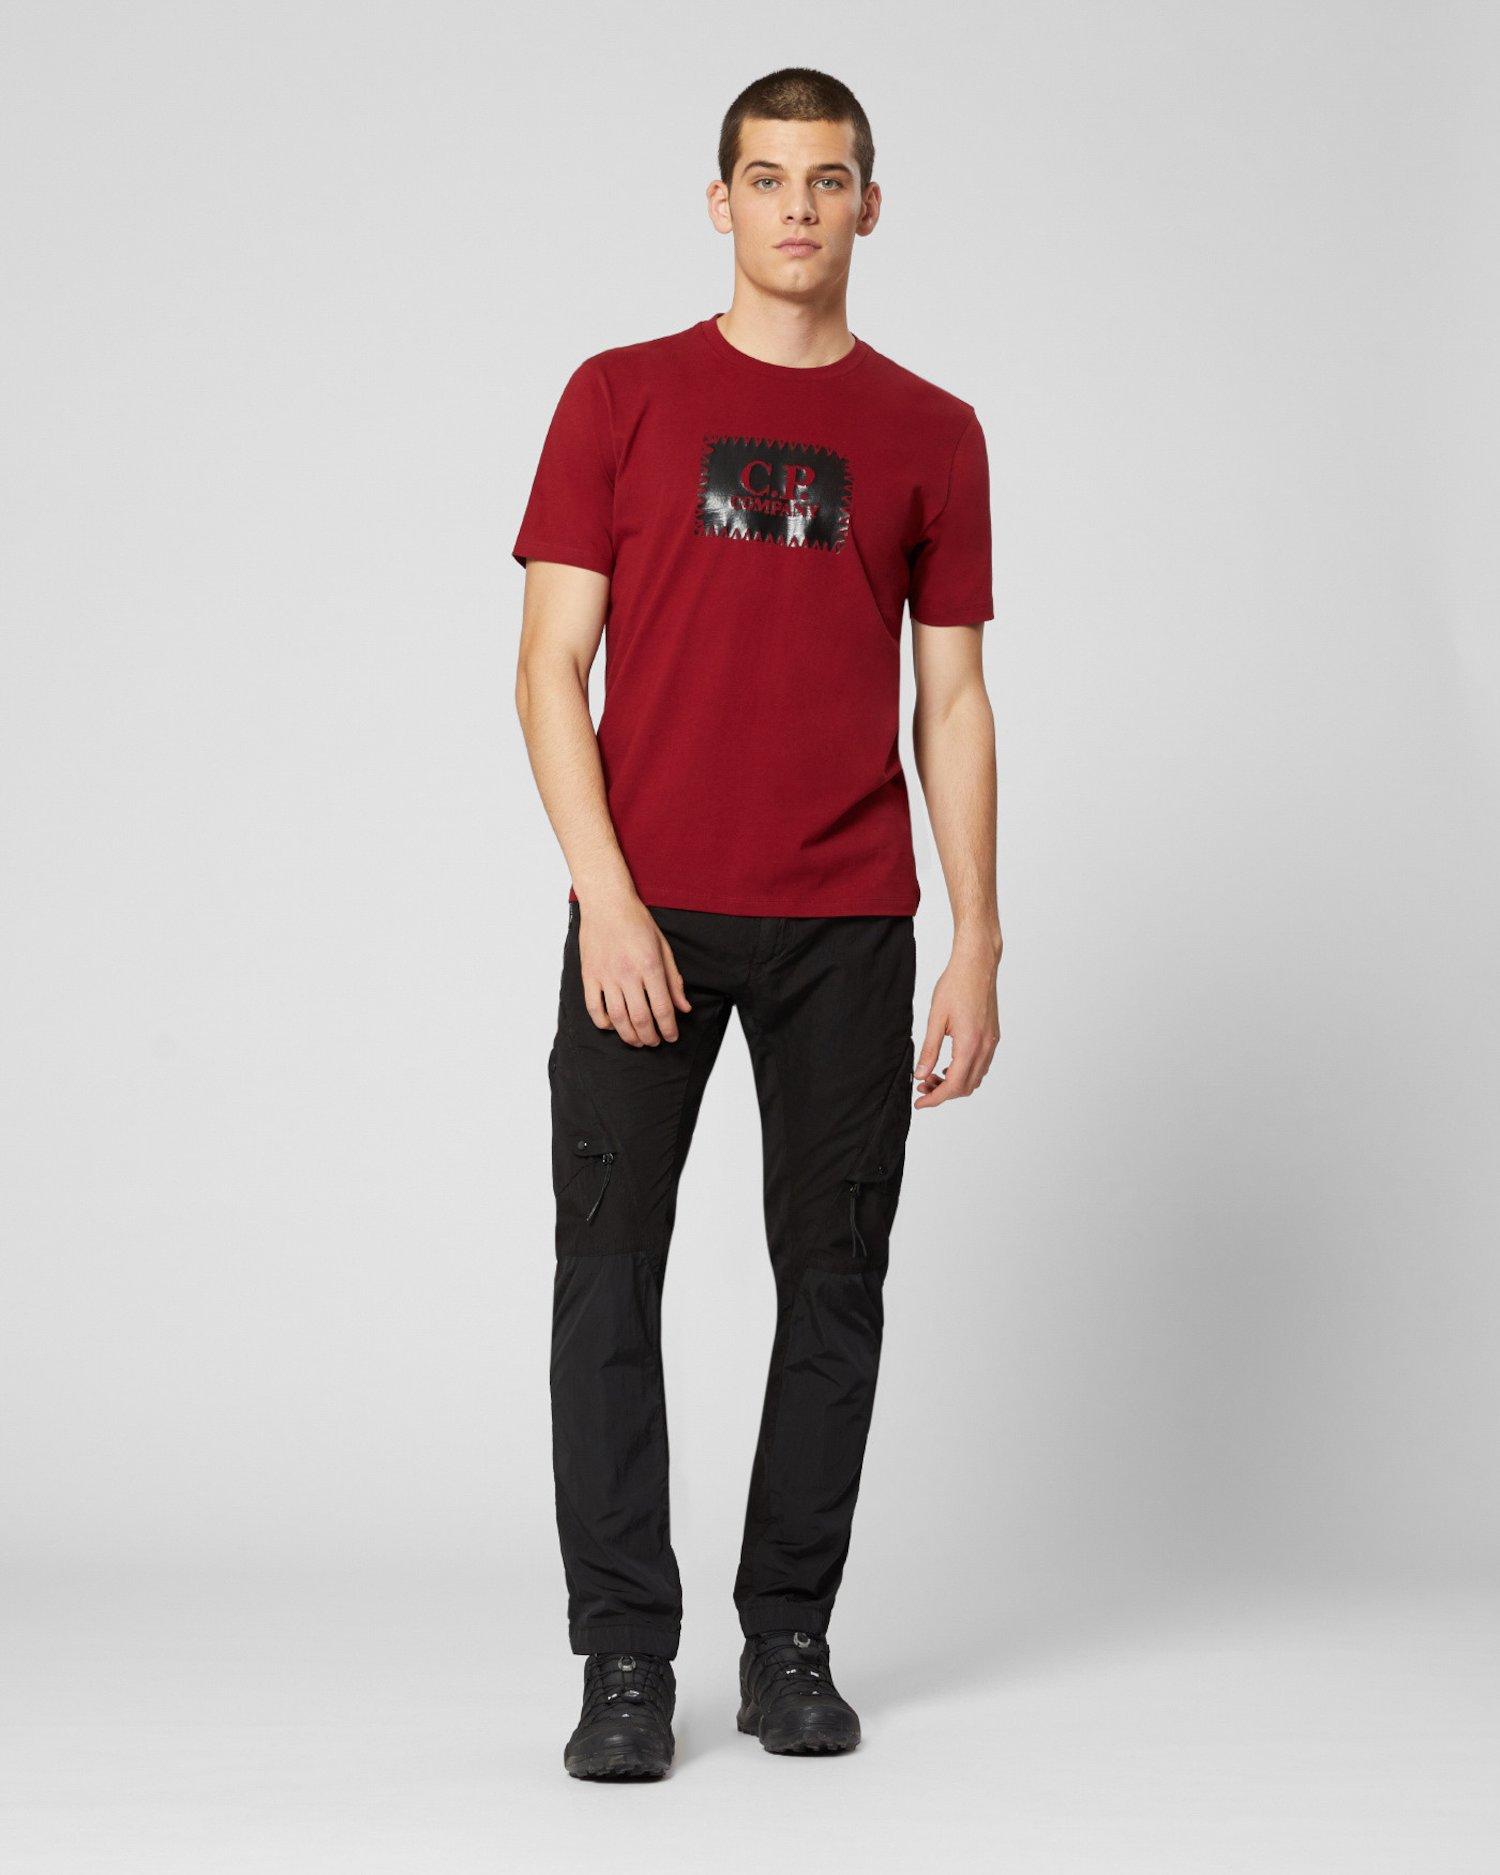 Jersey 30/1 Label Print T-Shirt